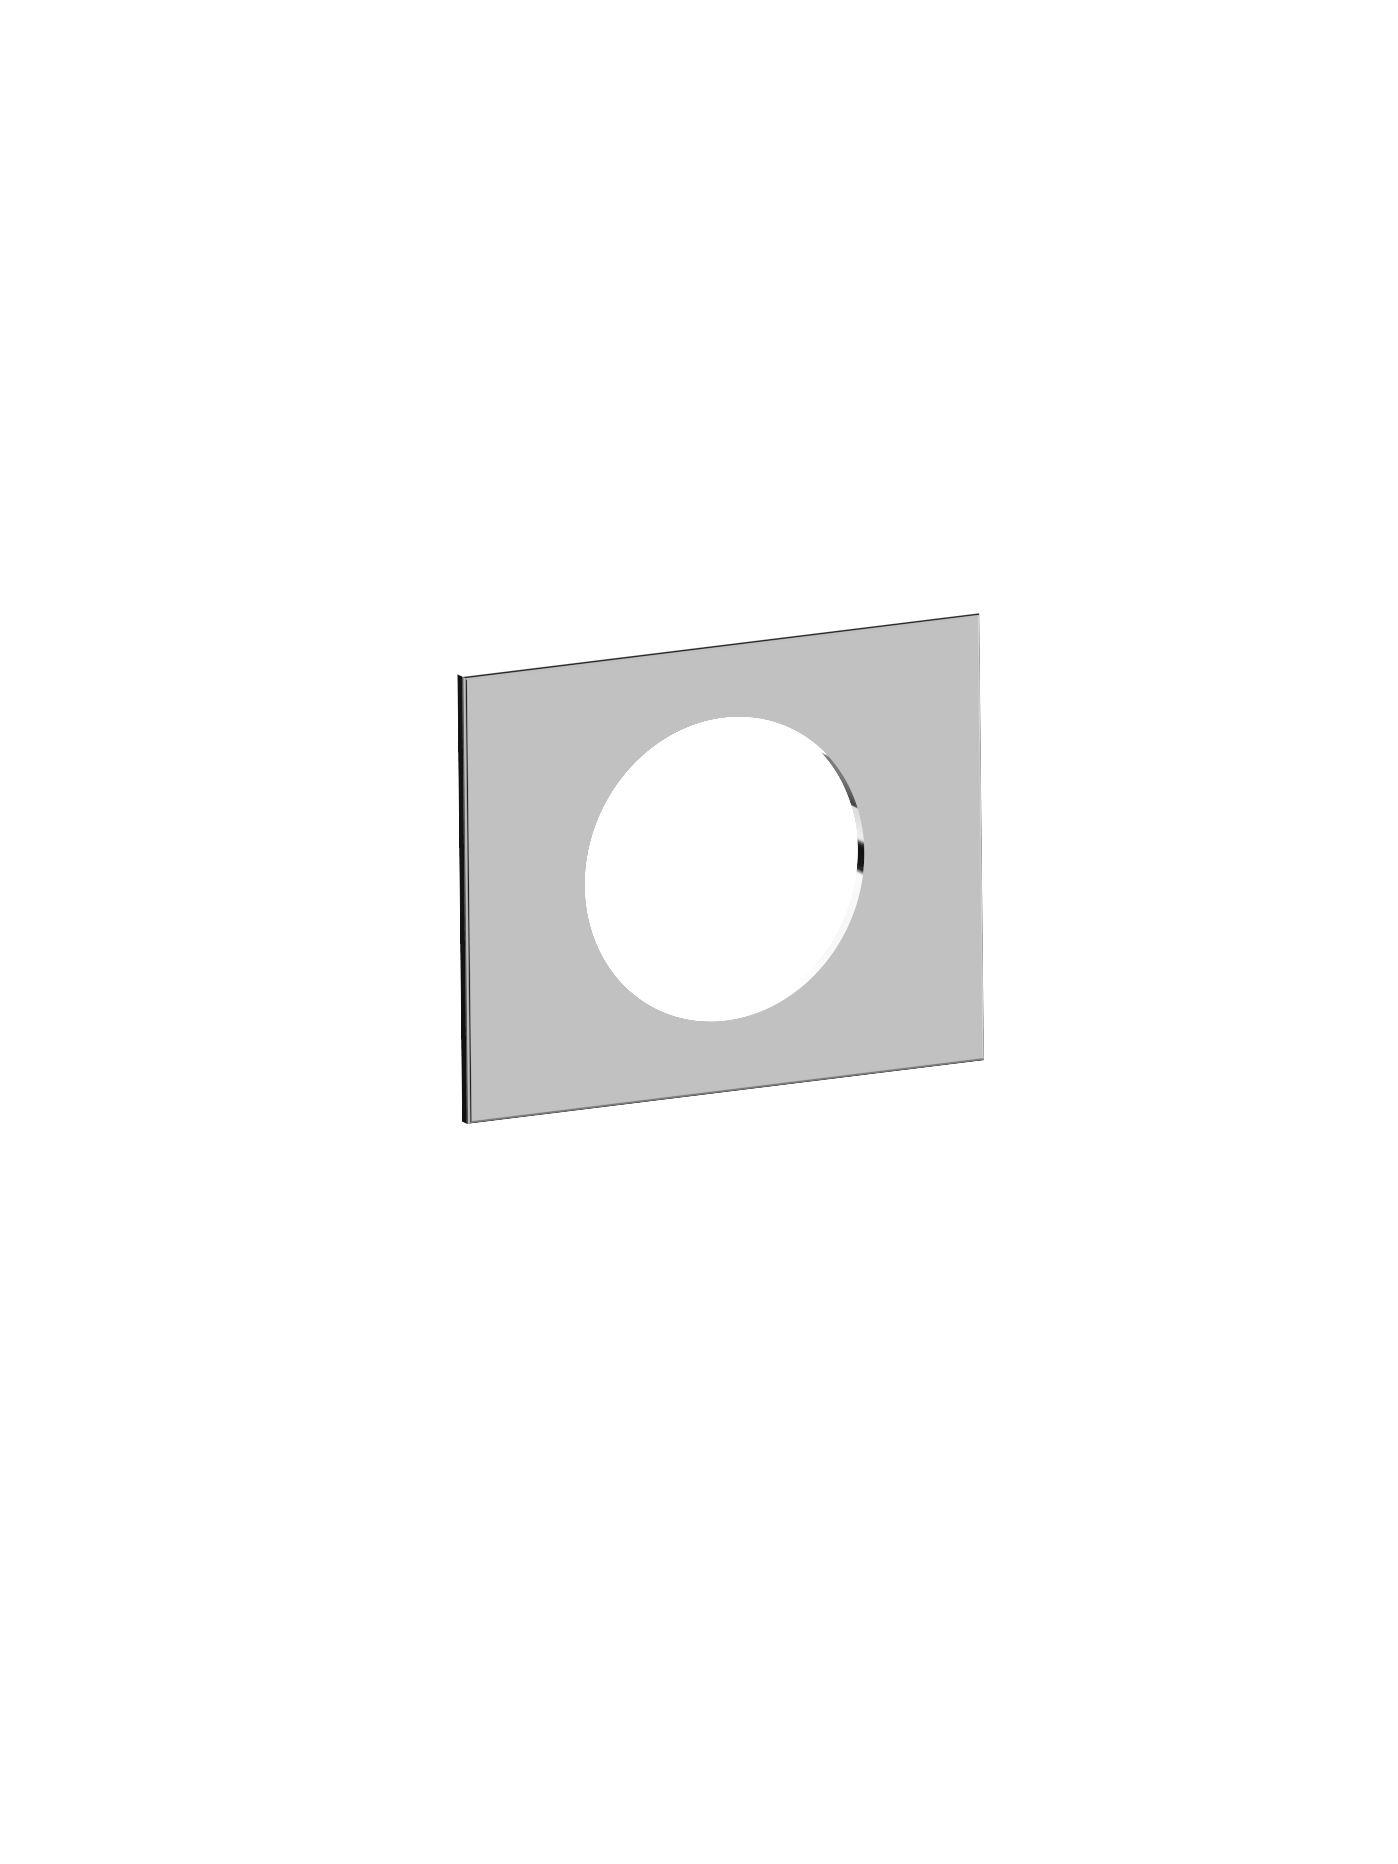 Rubinetterie F.lli Frattini - Spare Part R1904800